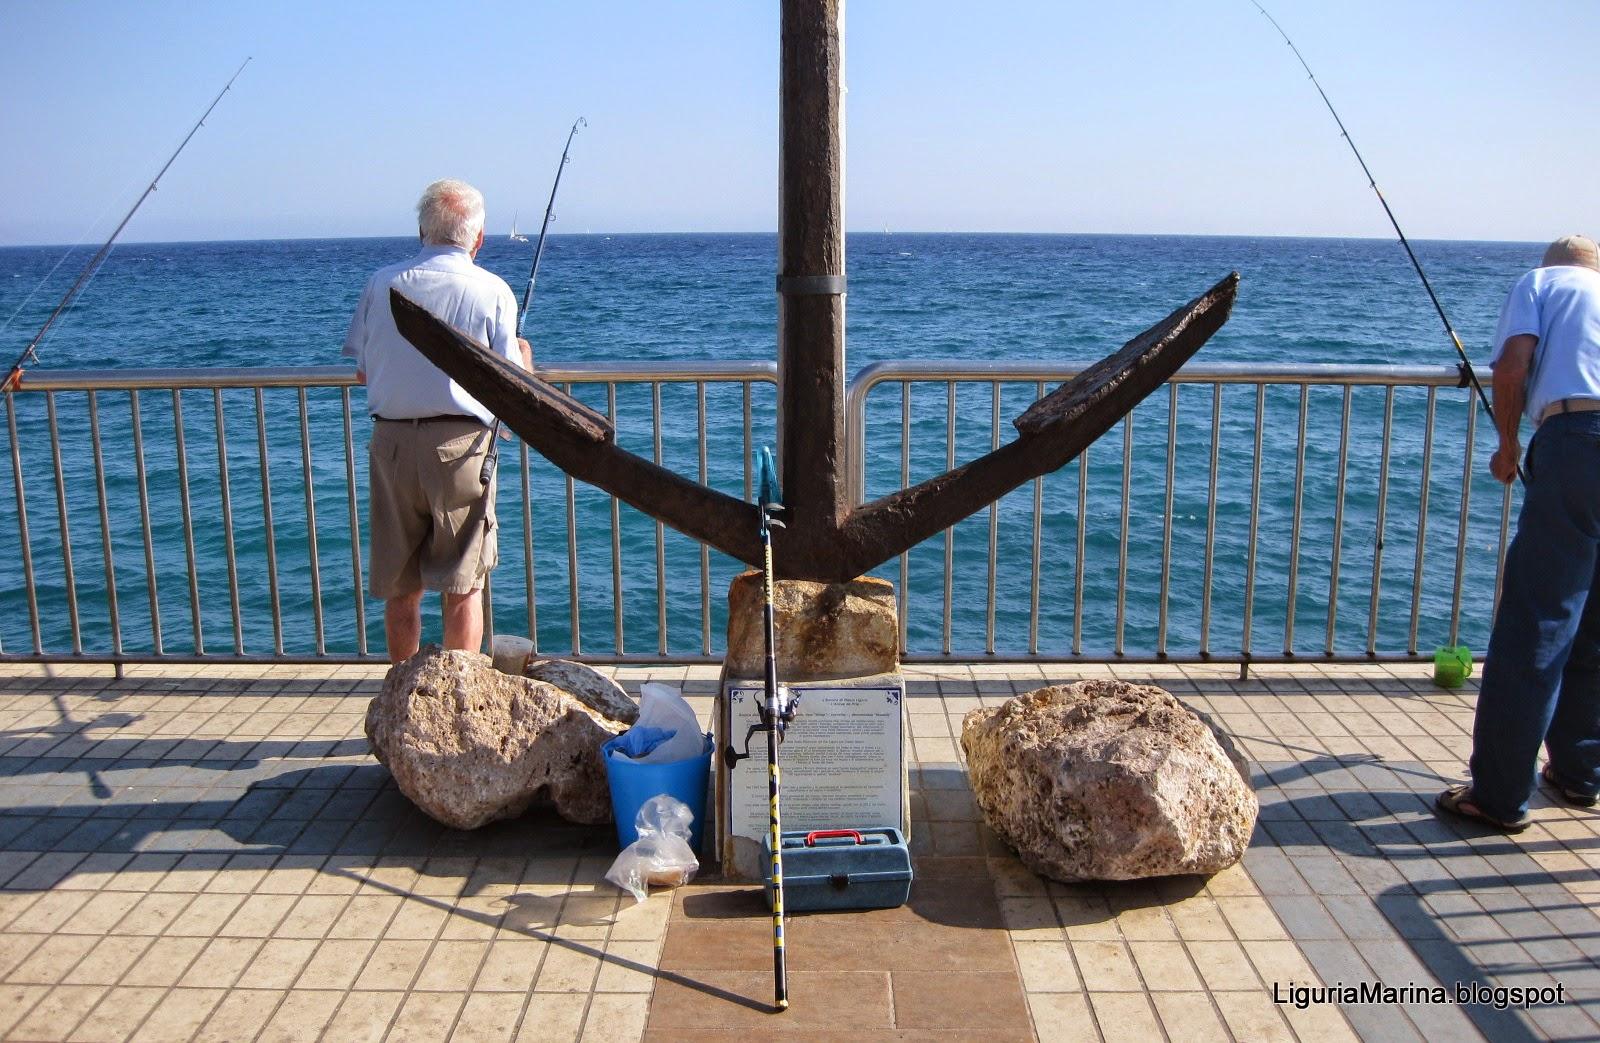 LiguriaMarina: Pietra Ligure